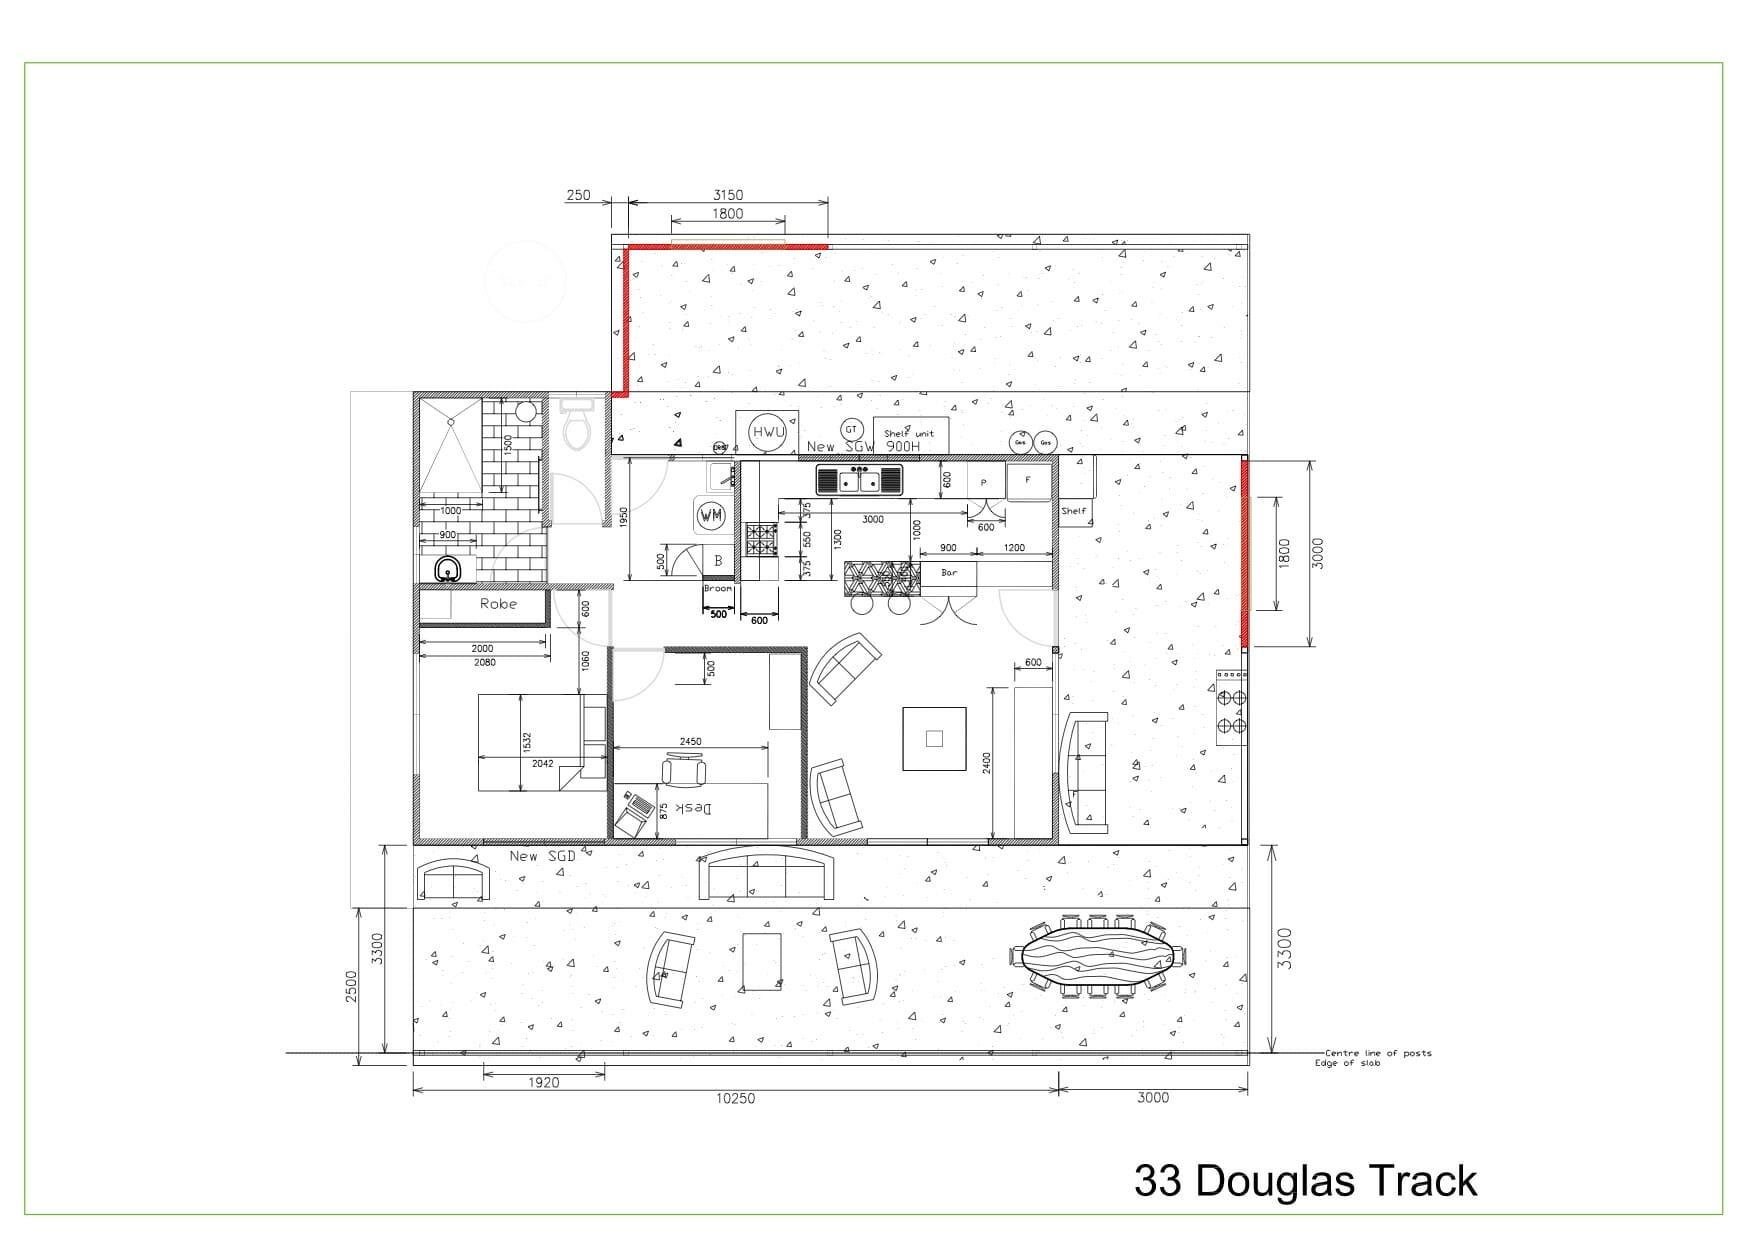 33 Douglas Track floor plan